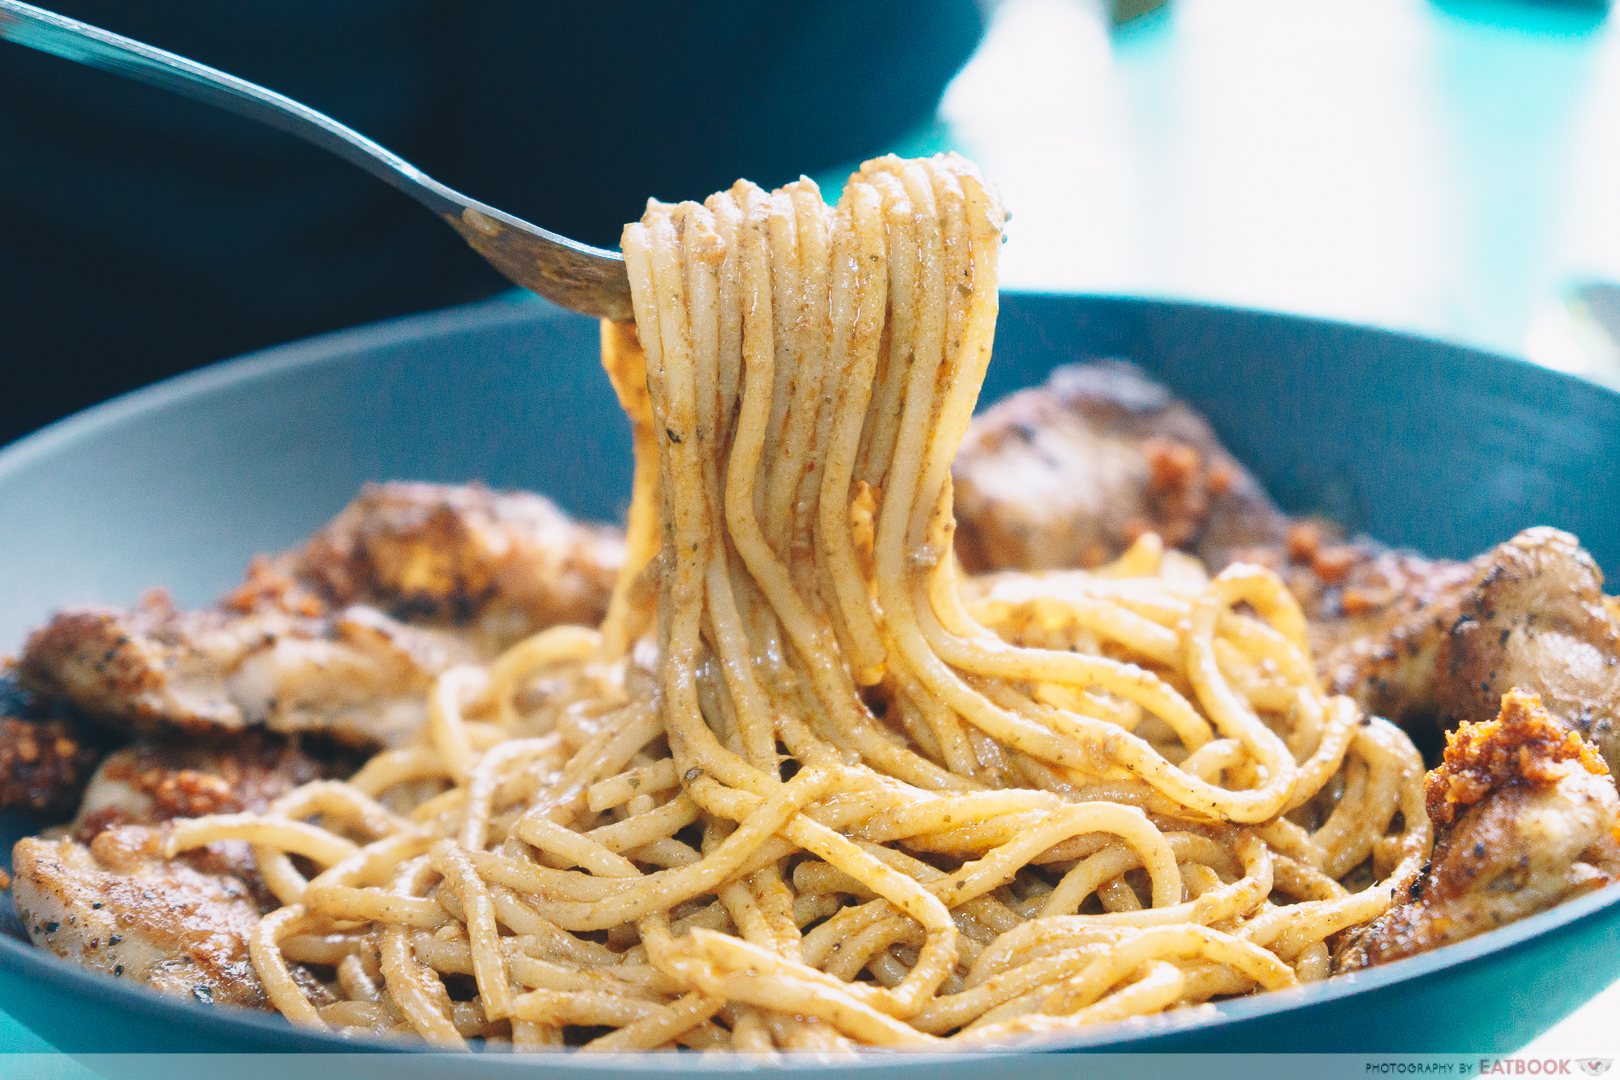 Eddy's No.1 - noodle pull